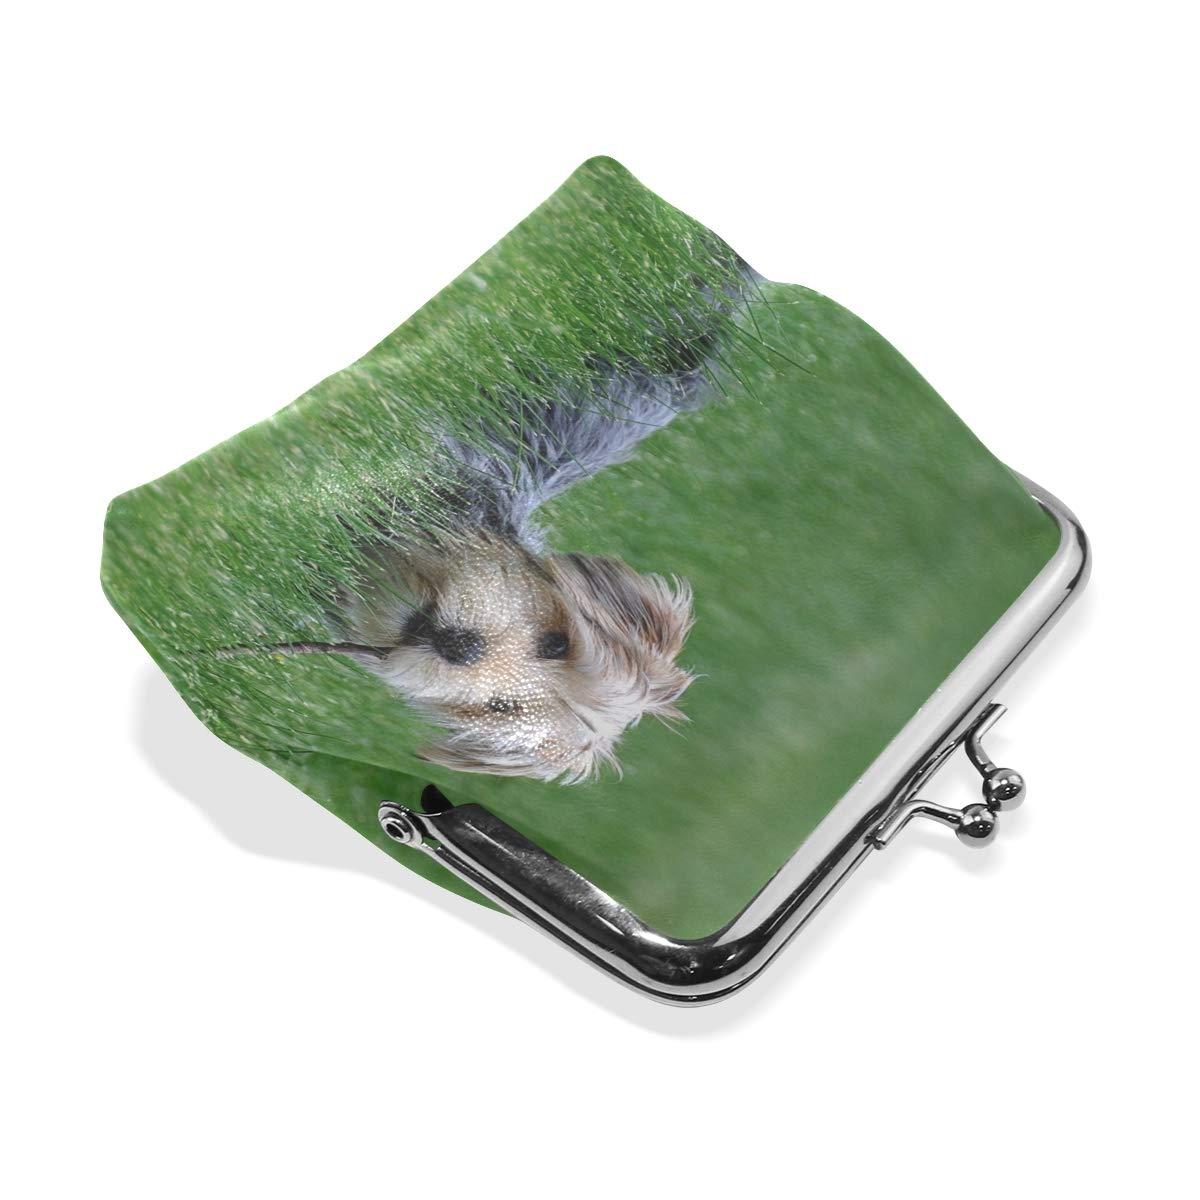 Rh Studio Coin Purse Dog Grass Walk Yorkshire Terrier Print Wallet Exquisite Clasp Coin Purse Girls Women Clutch Handbag